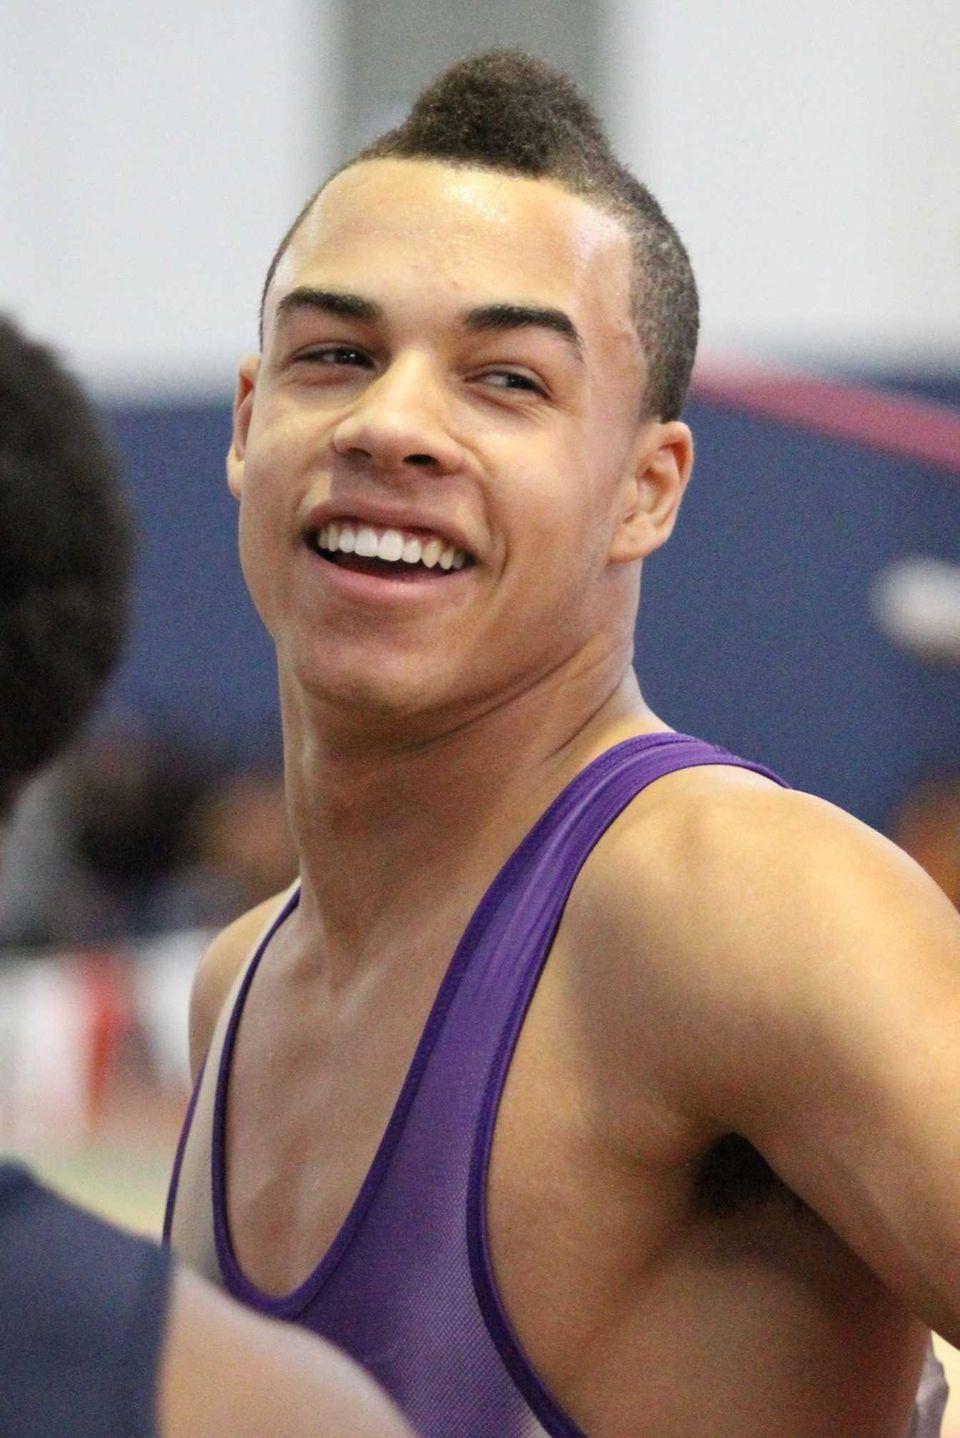 Sayville's Christopher Belcher celebrates his 55-meter dash win.